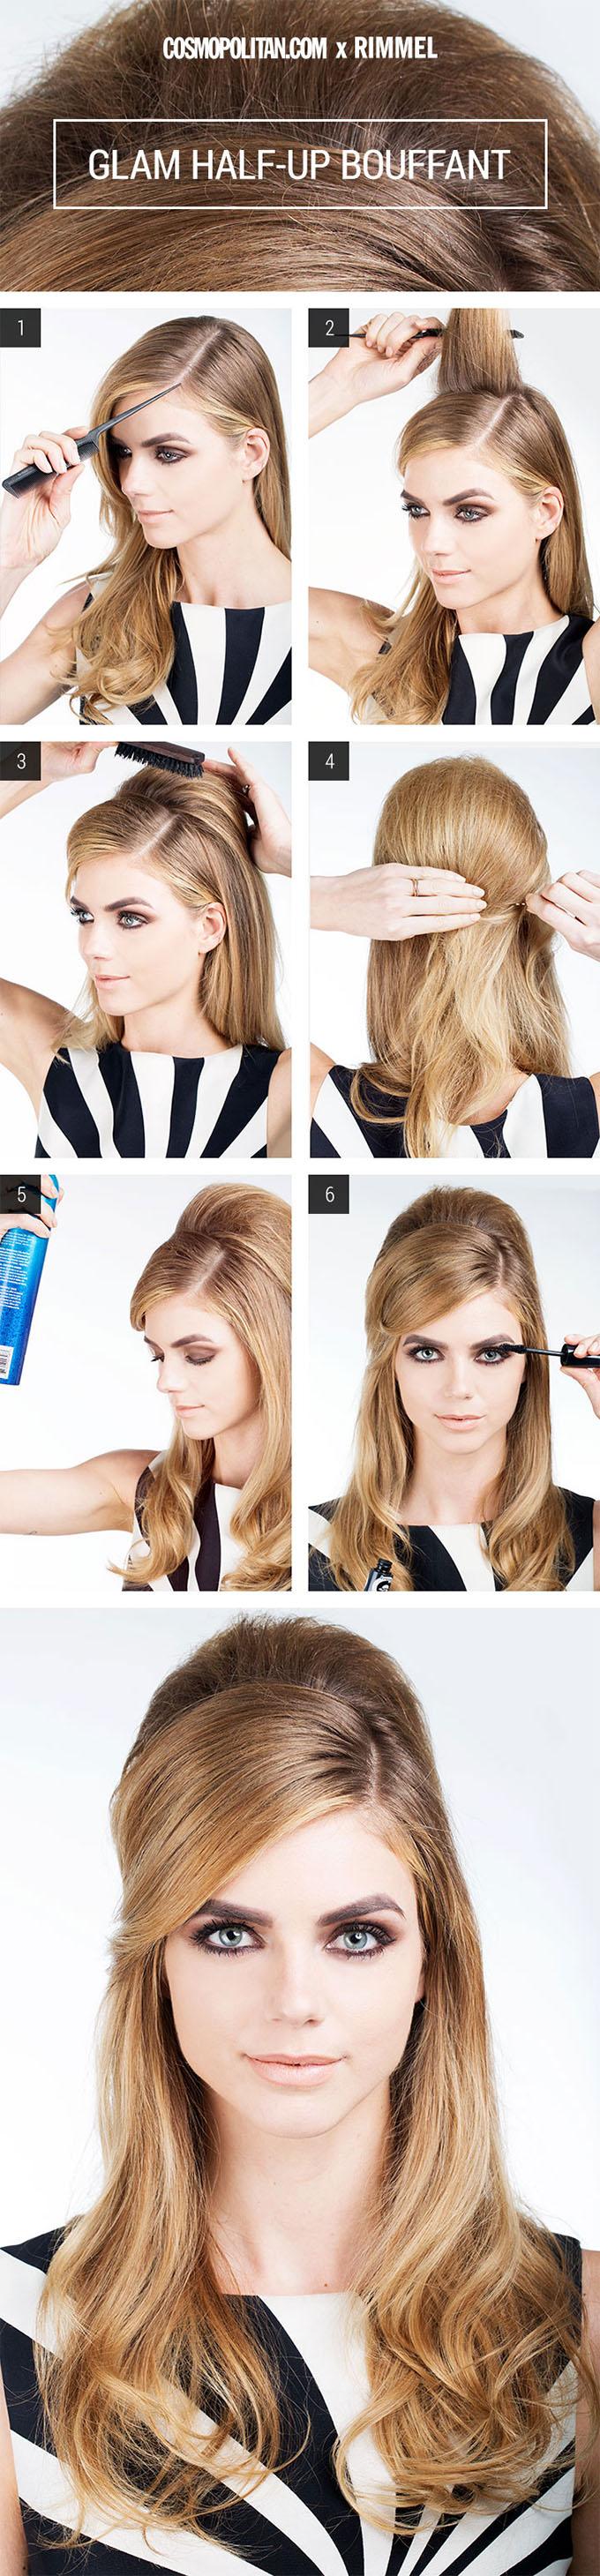 Halloween hairstyles - retro bouffant hair tutorial